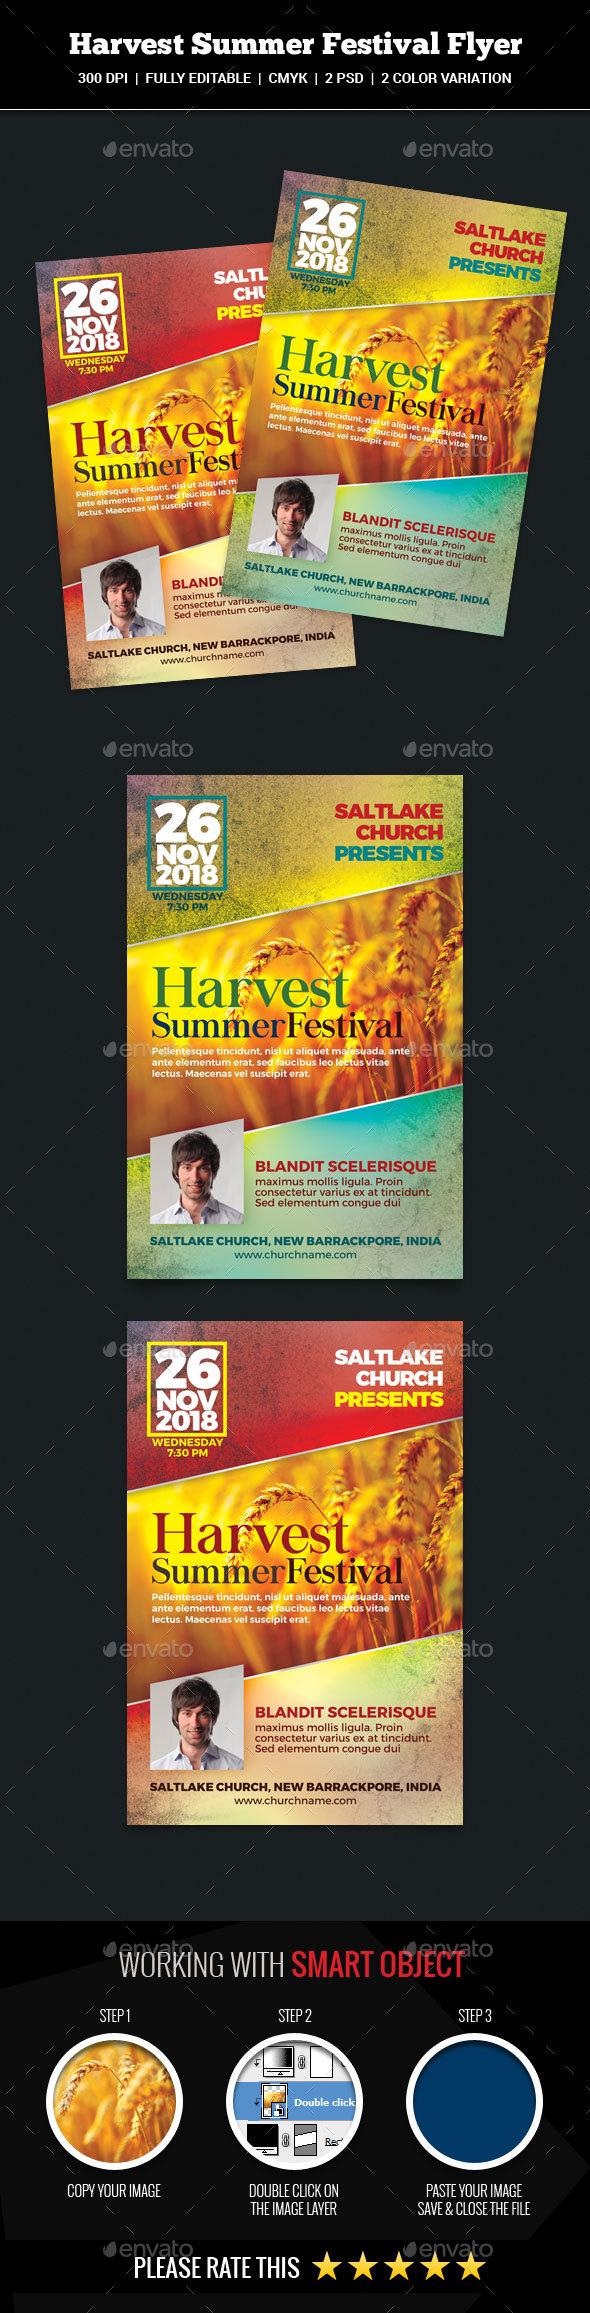 Harvest Summer Festival Flyer - Church Flyers